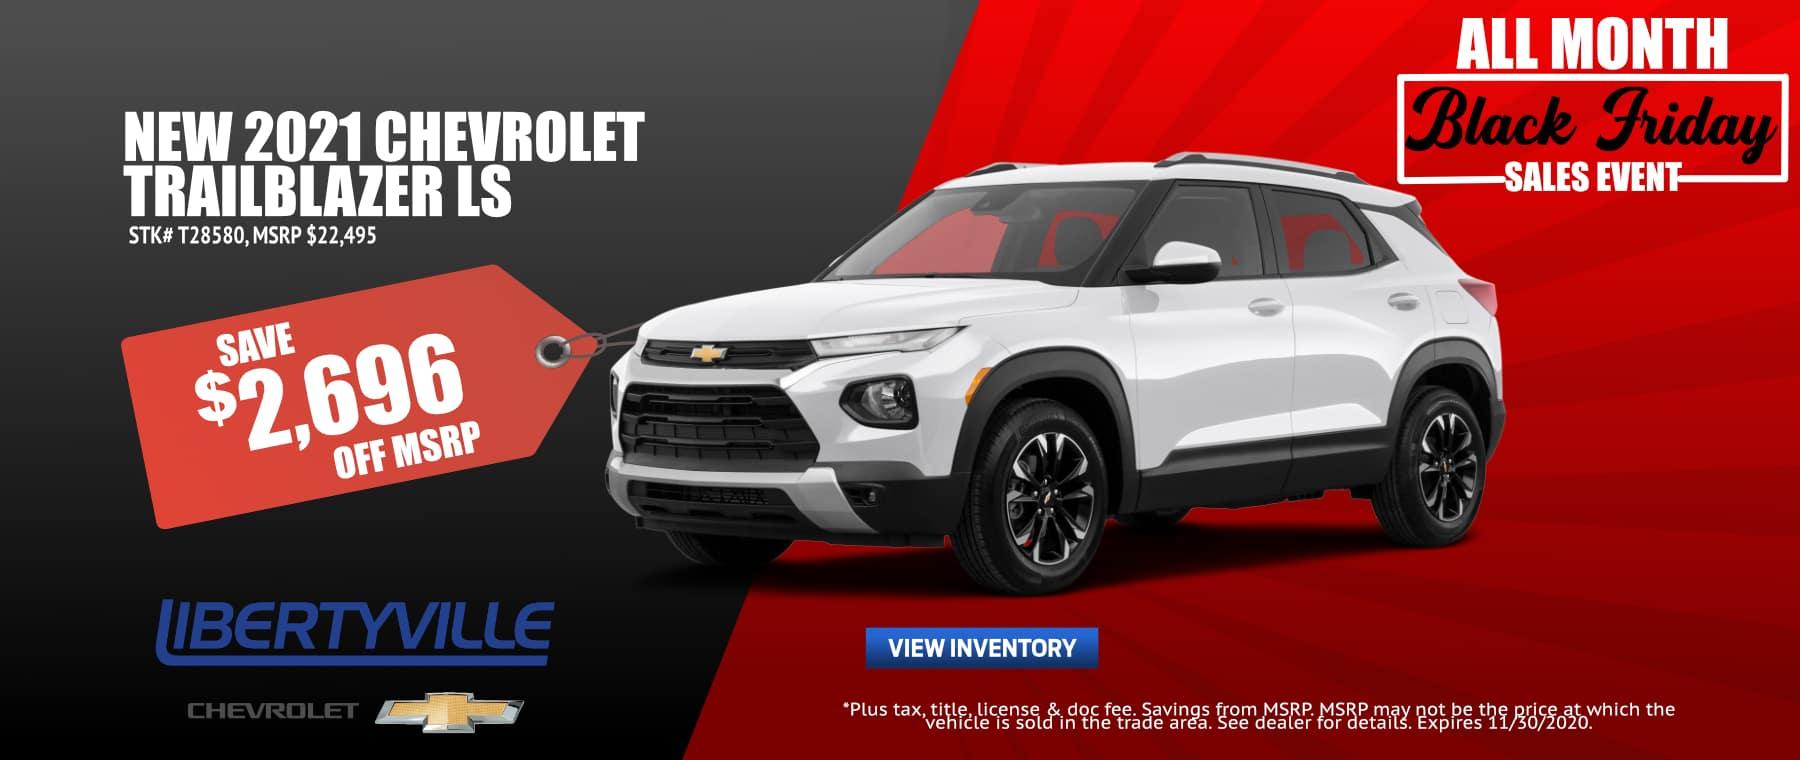 November-2020_Trailblazer_LIbertyville Chevrolet